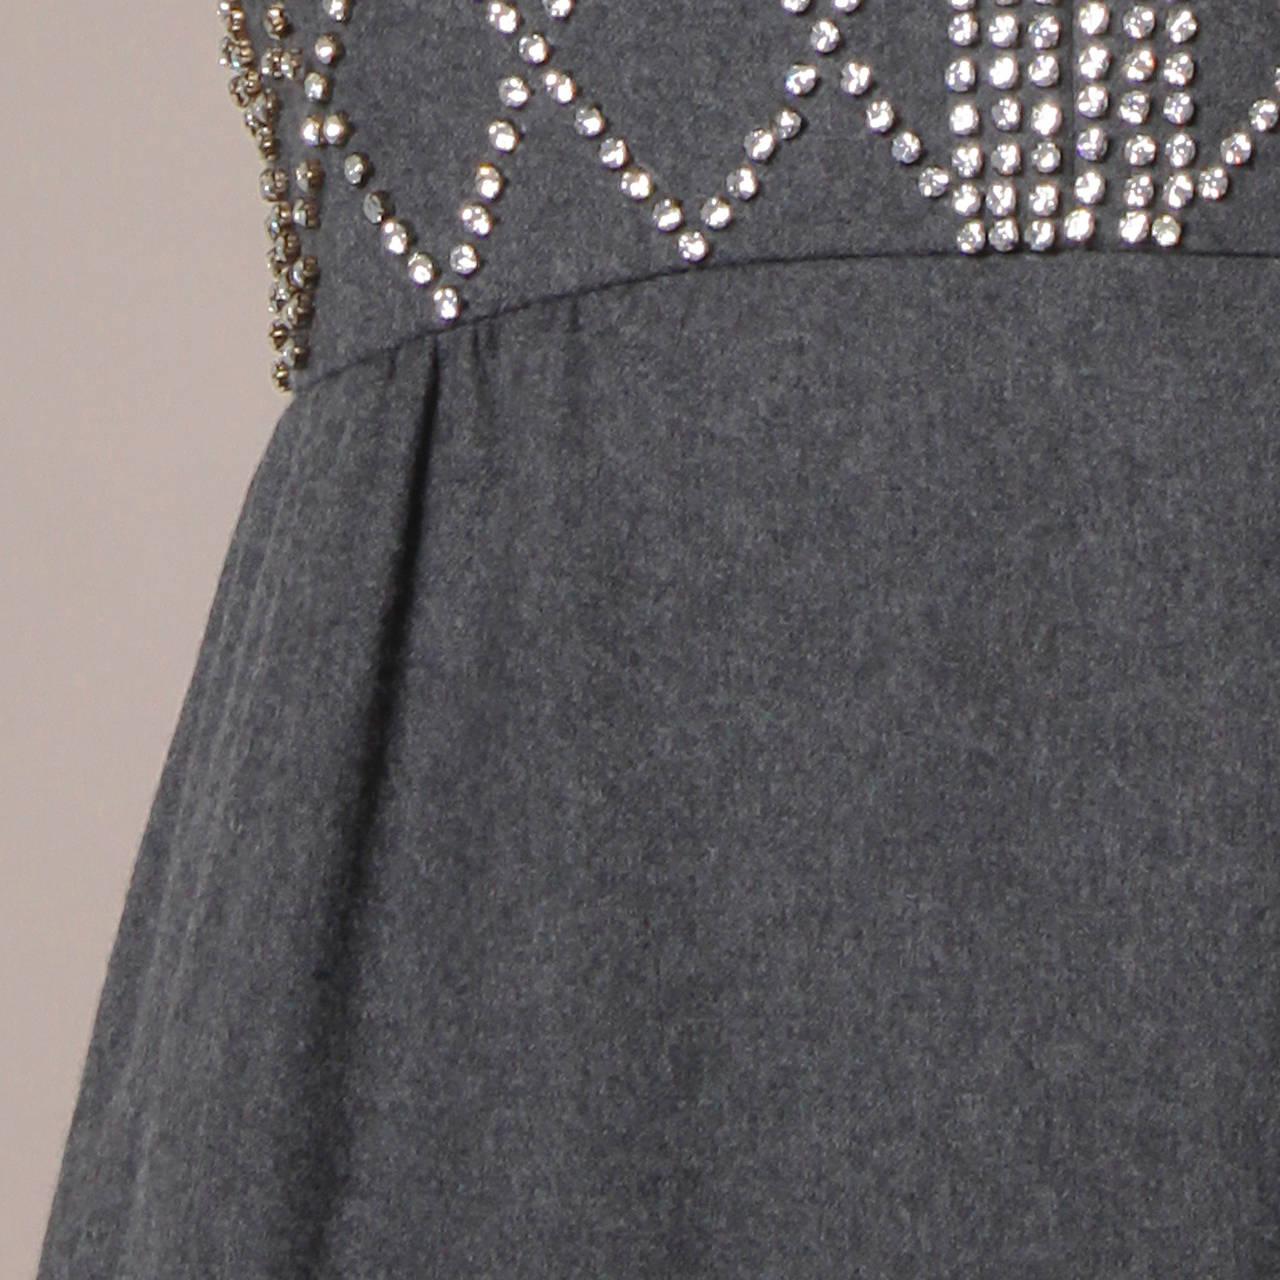 Women's Malcolm Starr Vintage 1960s Gray Wool Rhinestone Embellished Maxi Dress For Sale